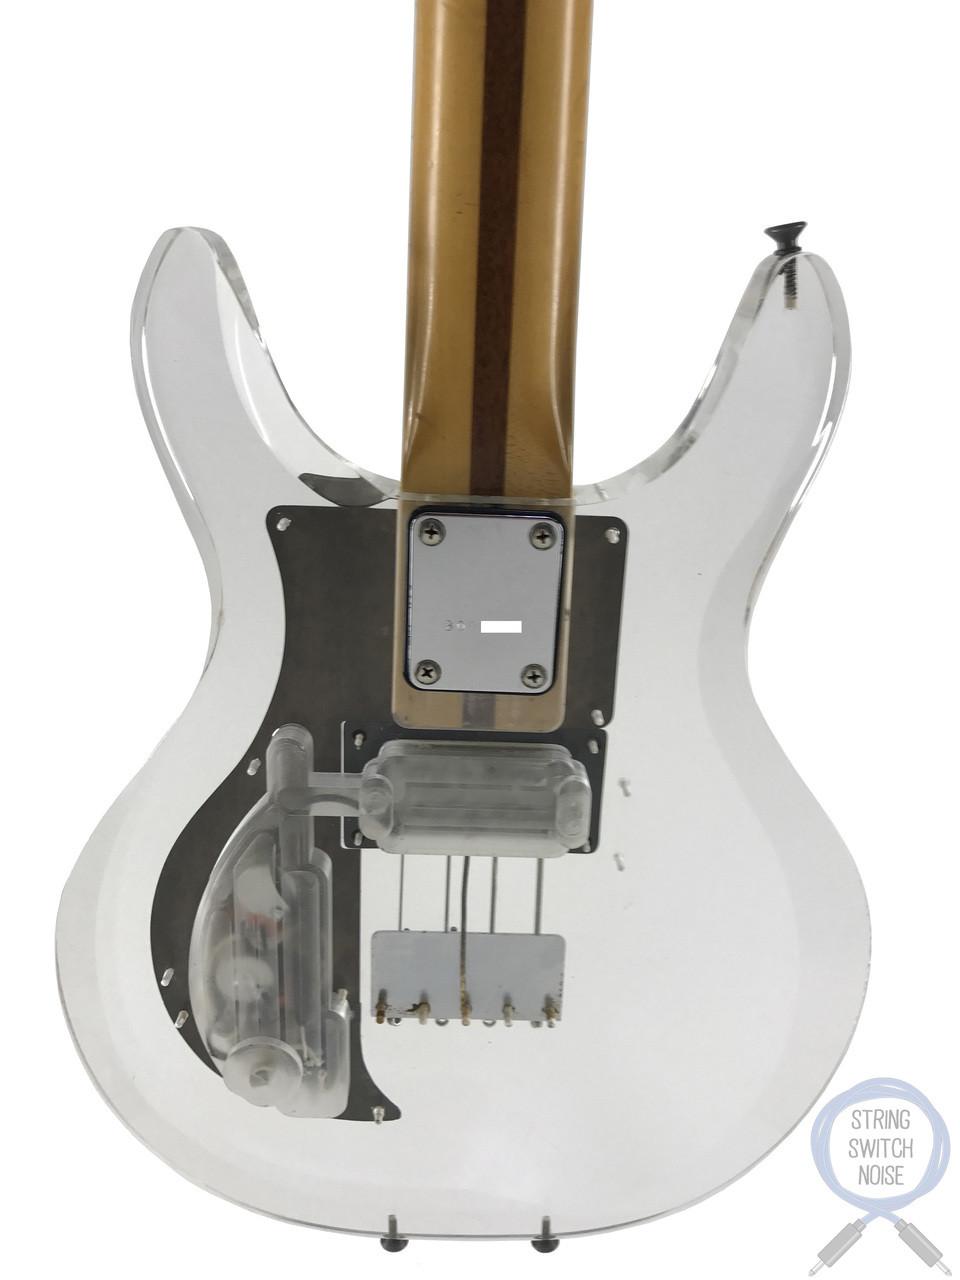 Greco, (Ampeg/Dan Armstrong) Bass, APB1000, Lucite/Plexi Body, 1990